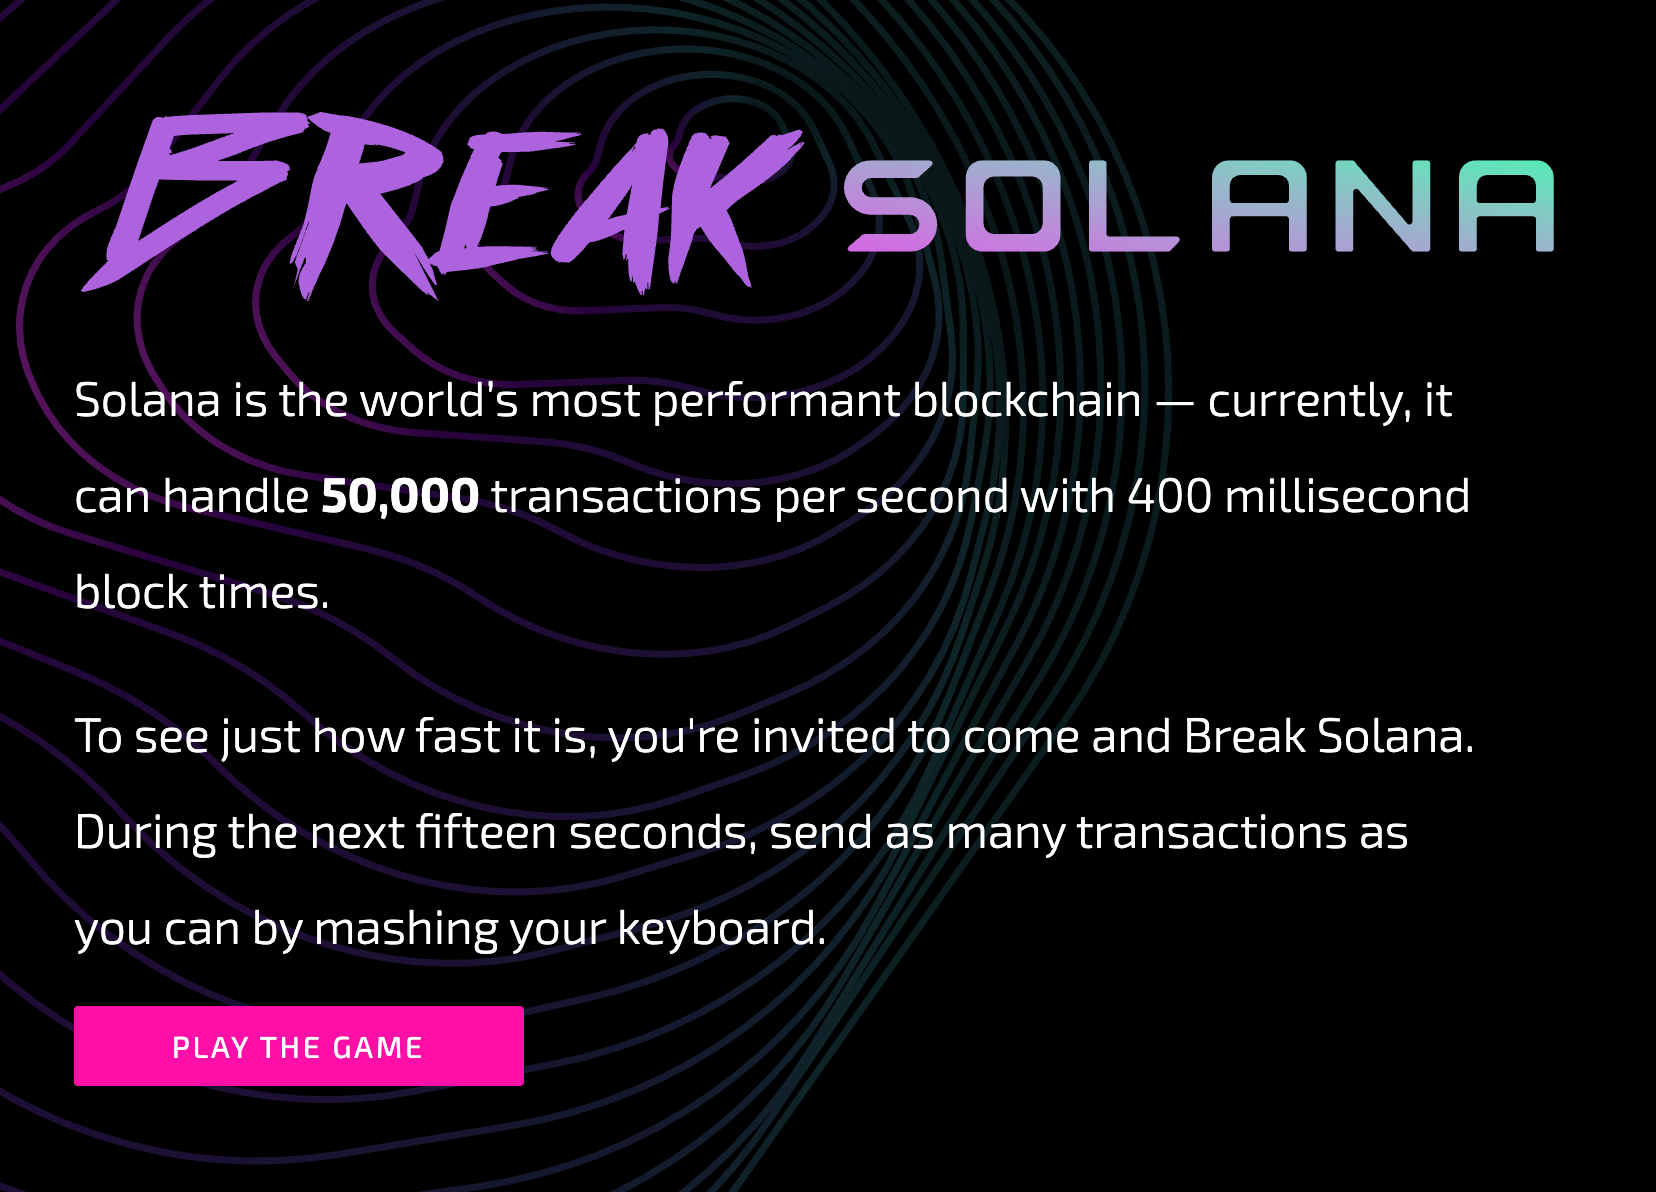 Solana: Just reboot it